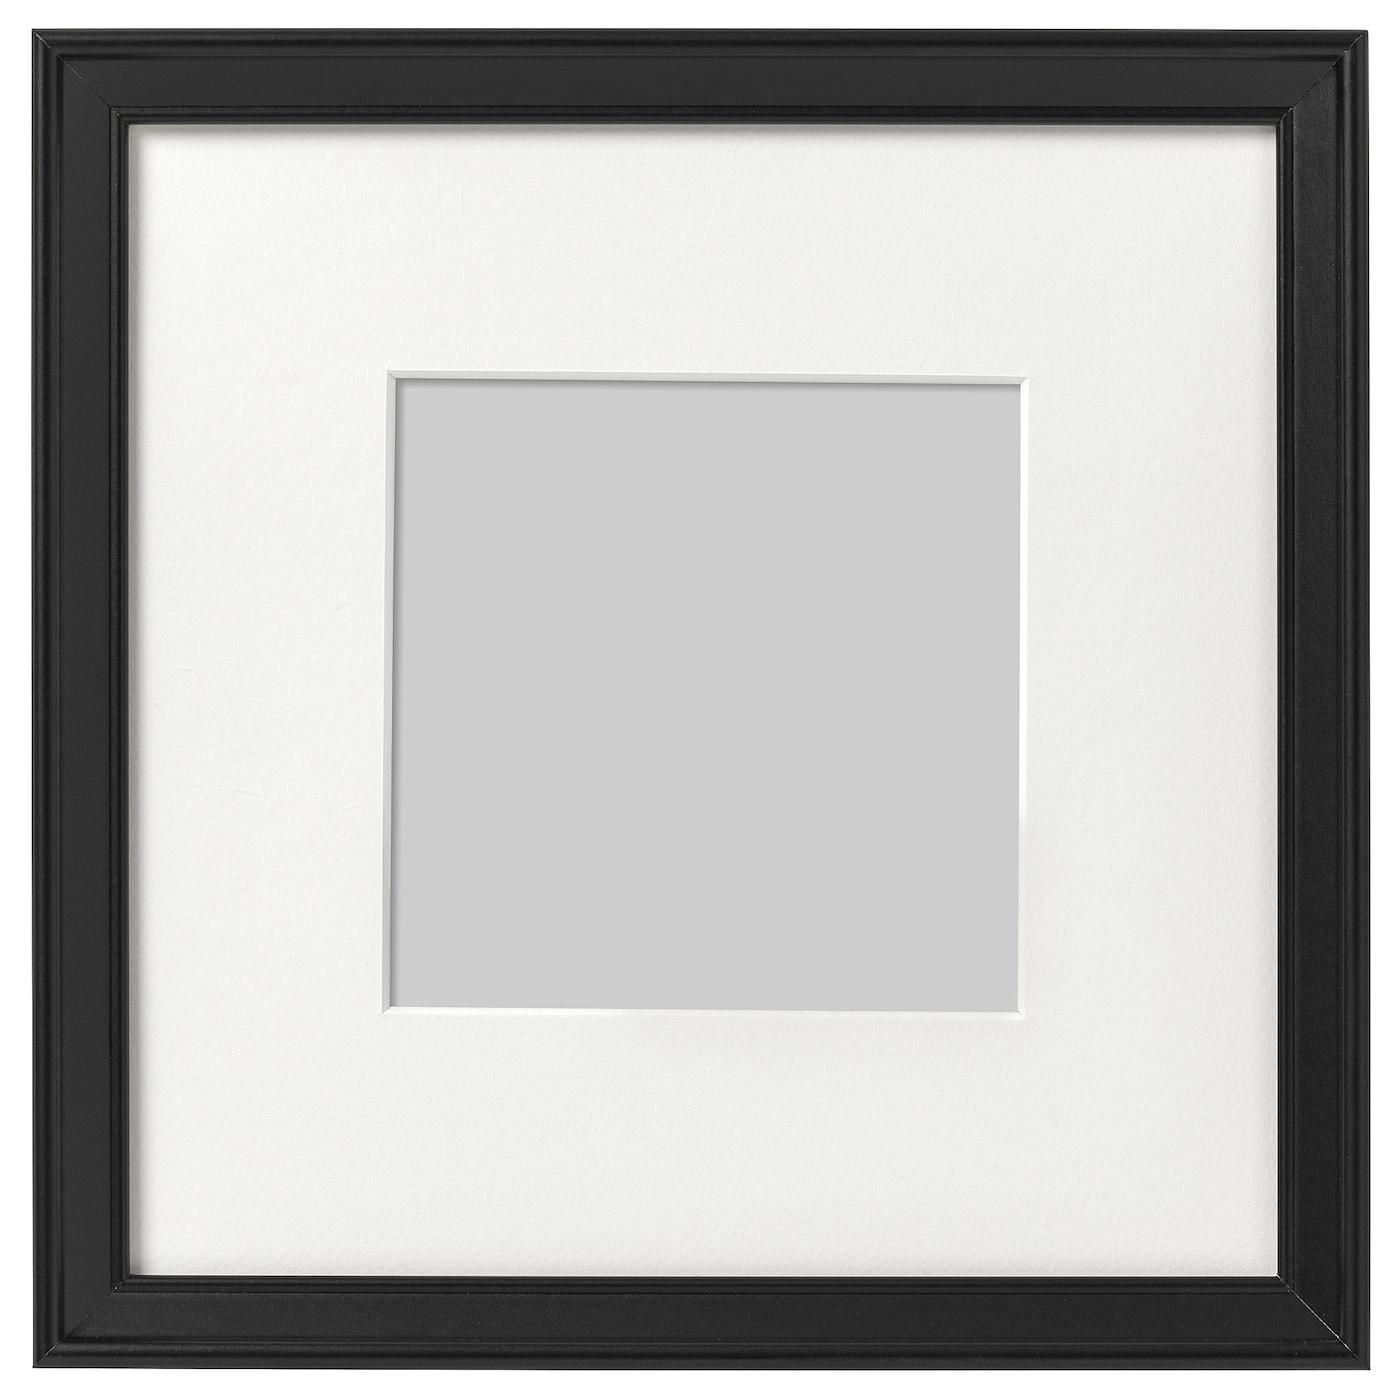 knopp ng cadre noir 23 x 23 cm ikea. Black Bedroom Furniture Sets. Home Design Ideas